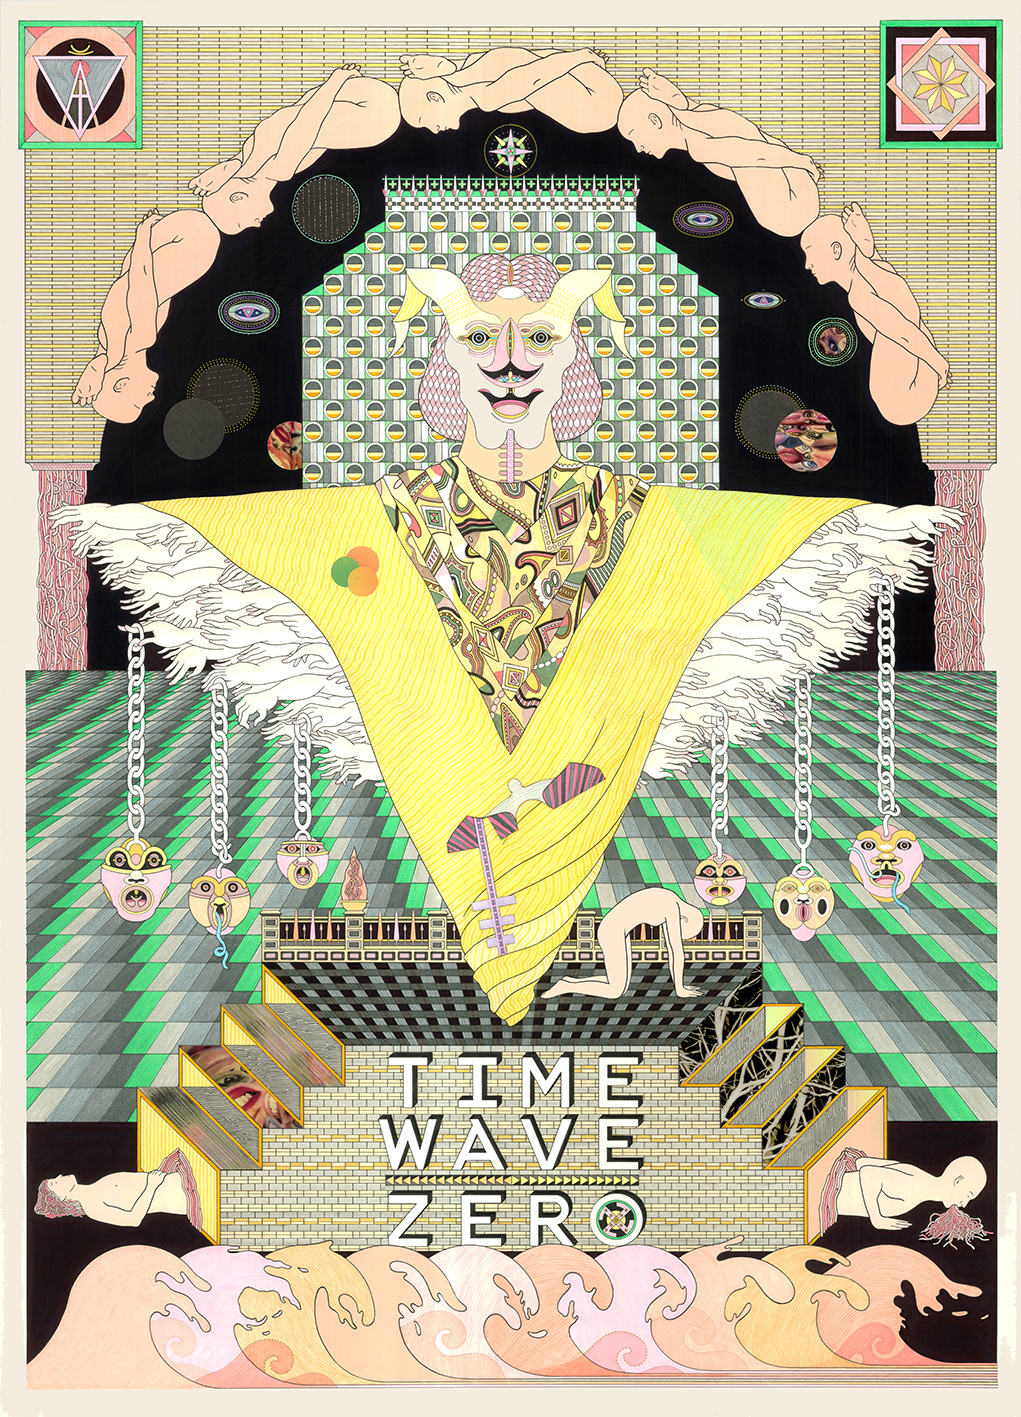 Time Wave Zero, 2014